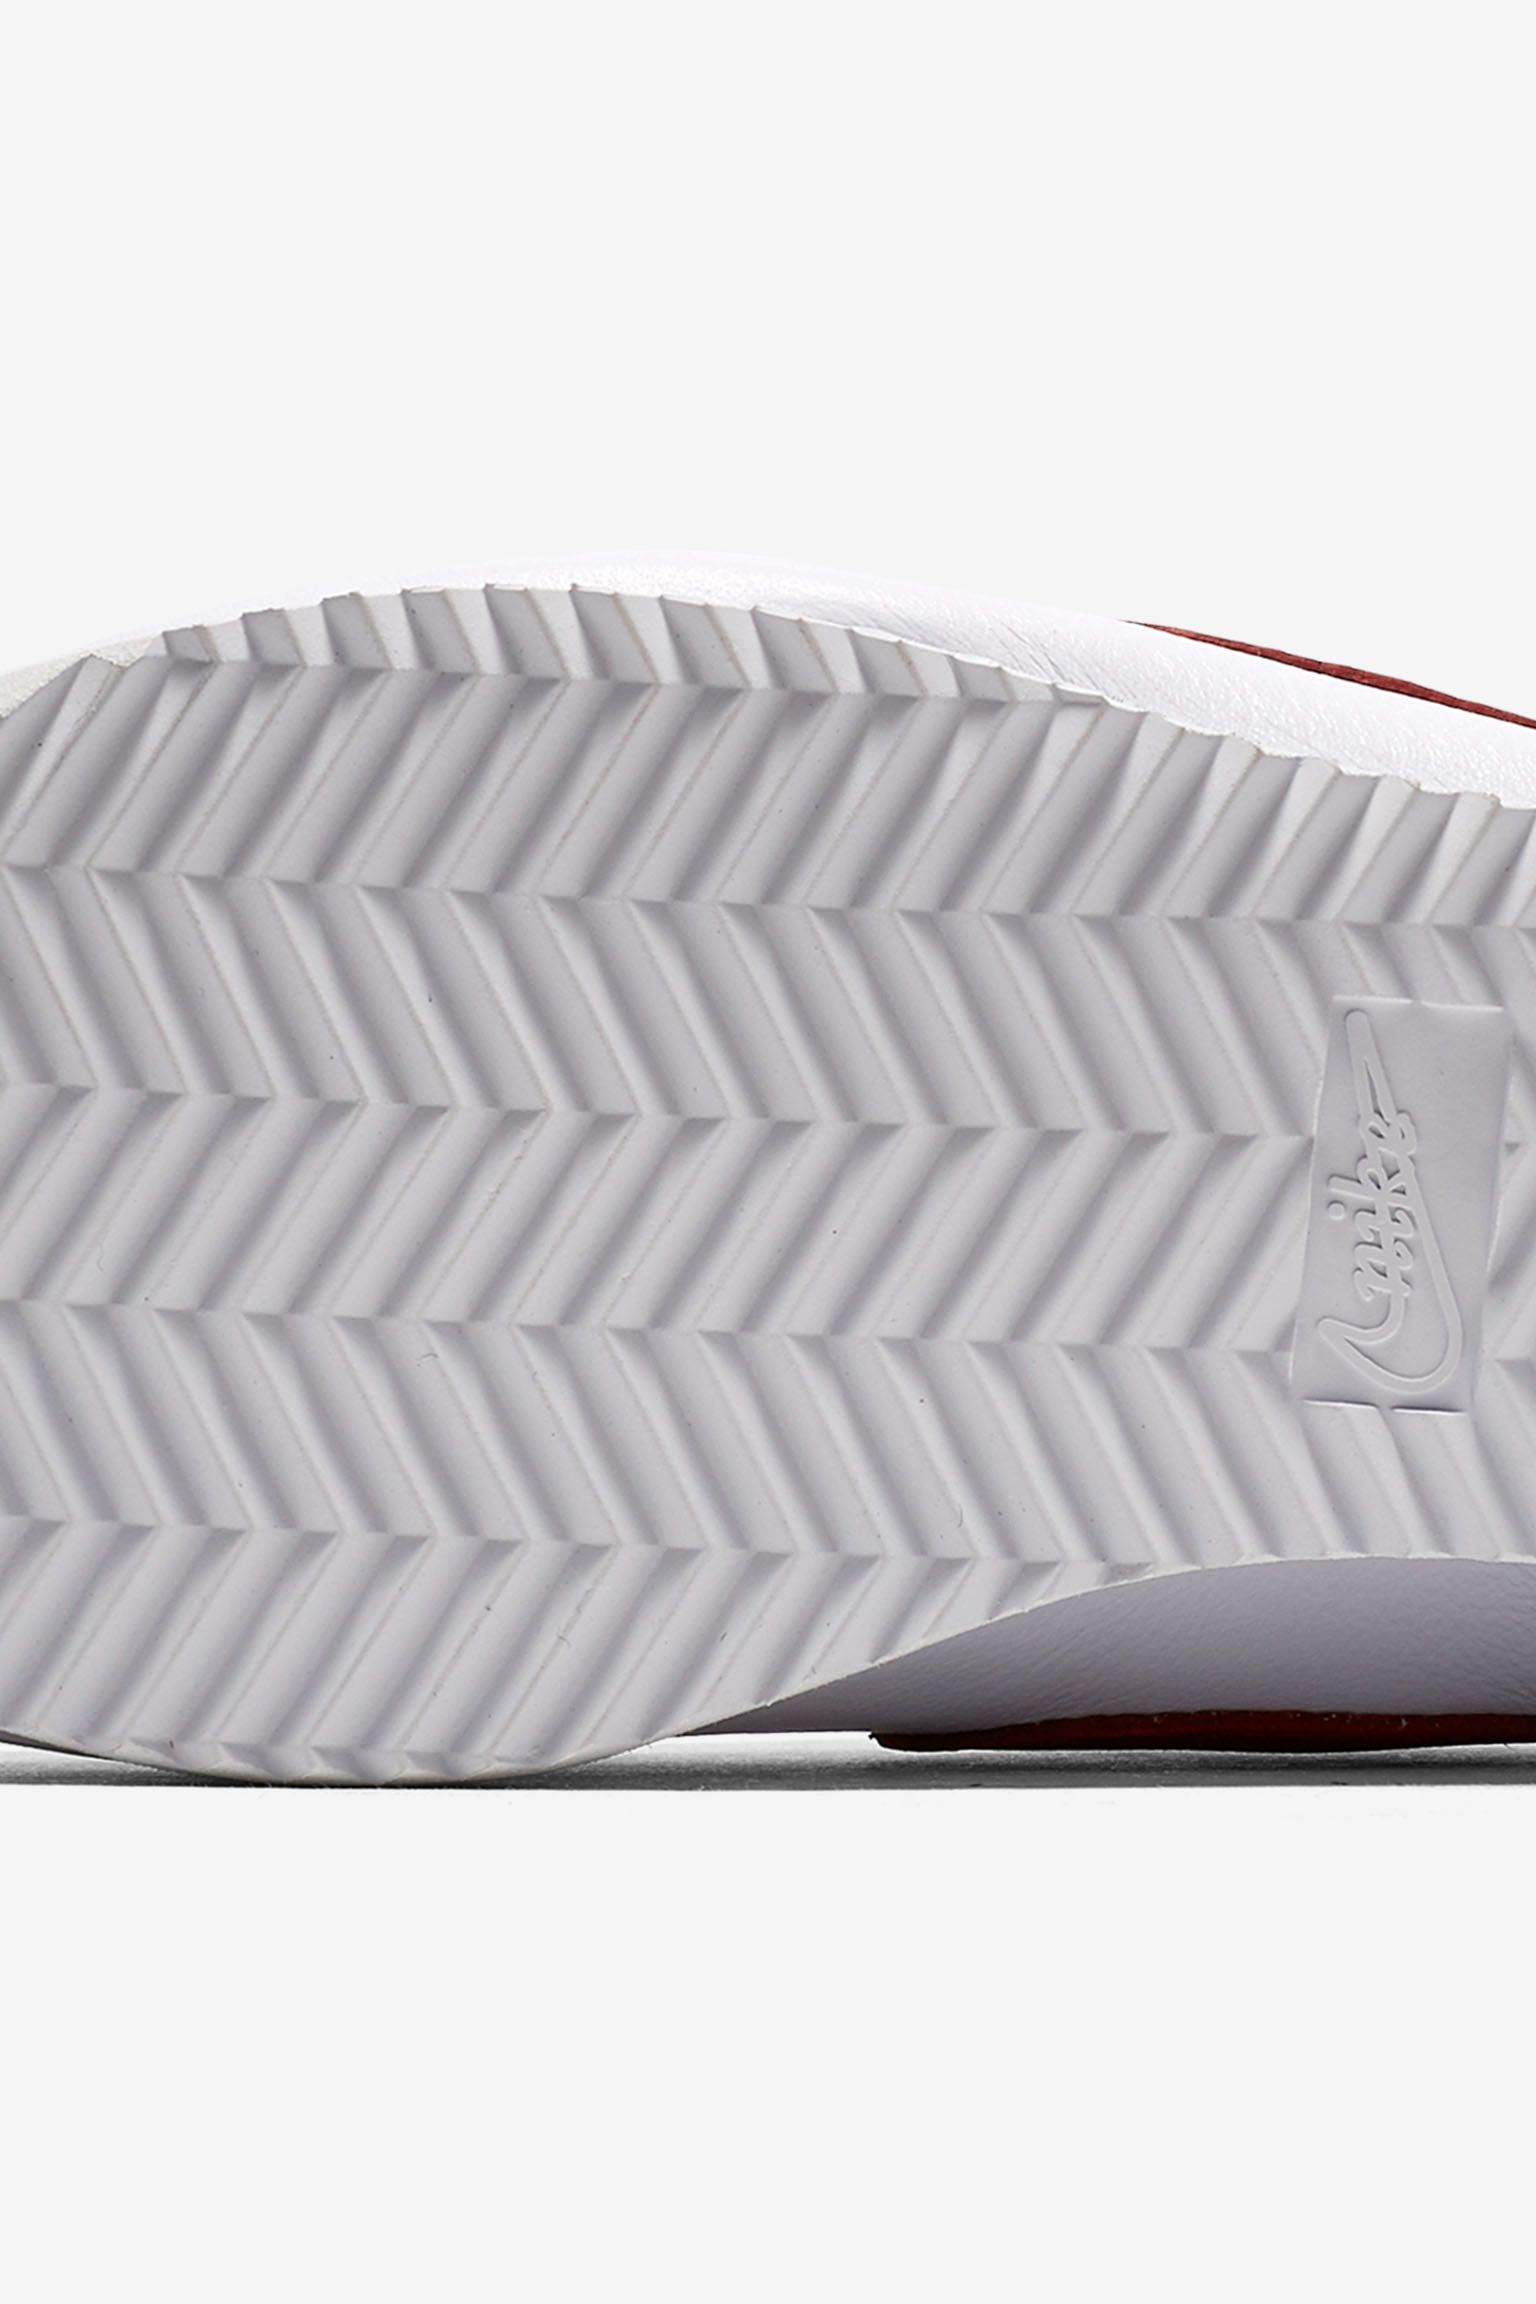 Women's Nike Cortez 72 'White & University Red'